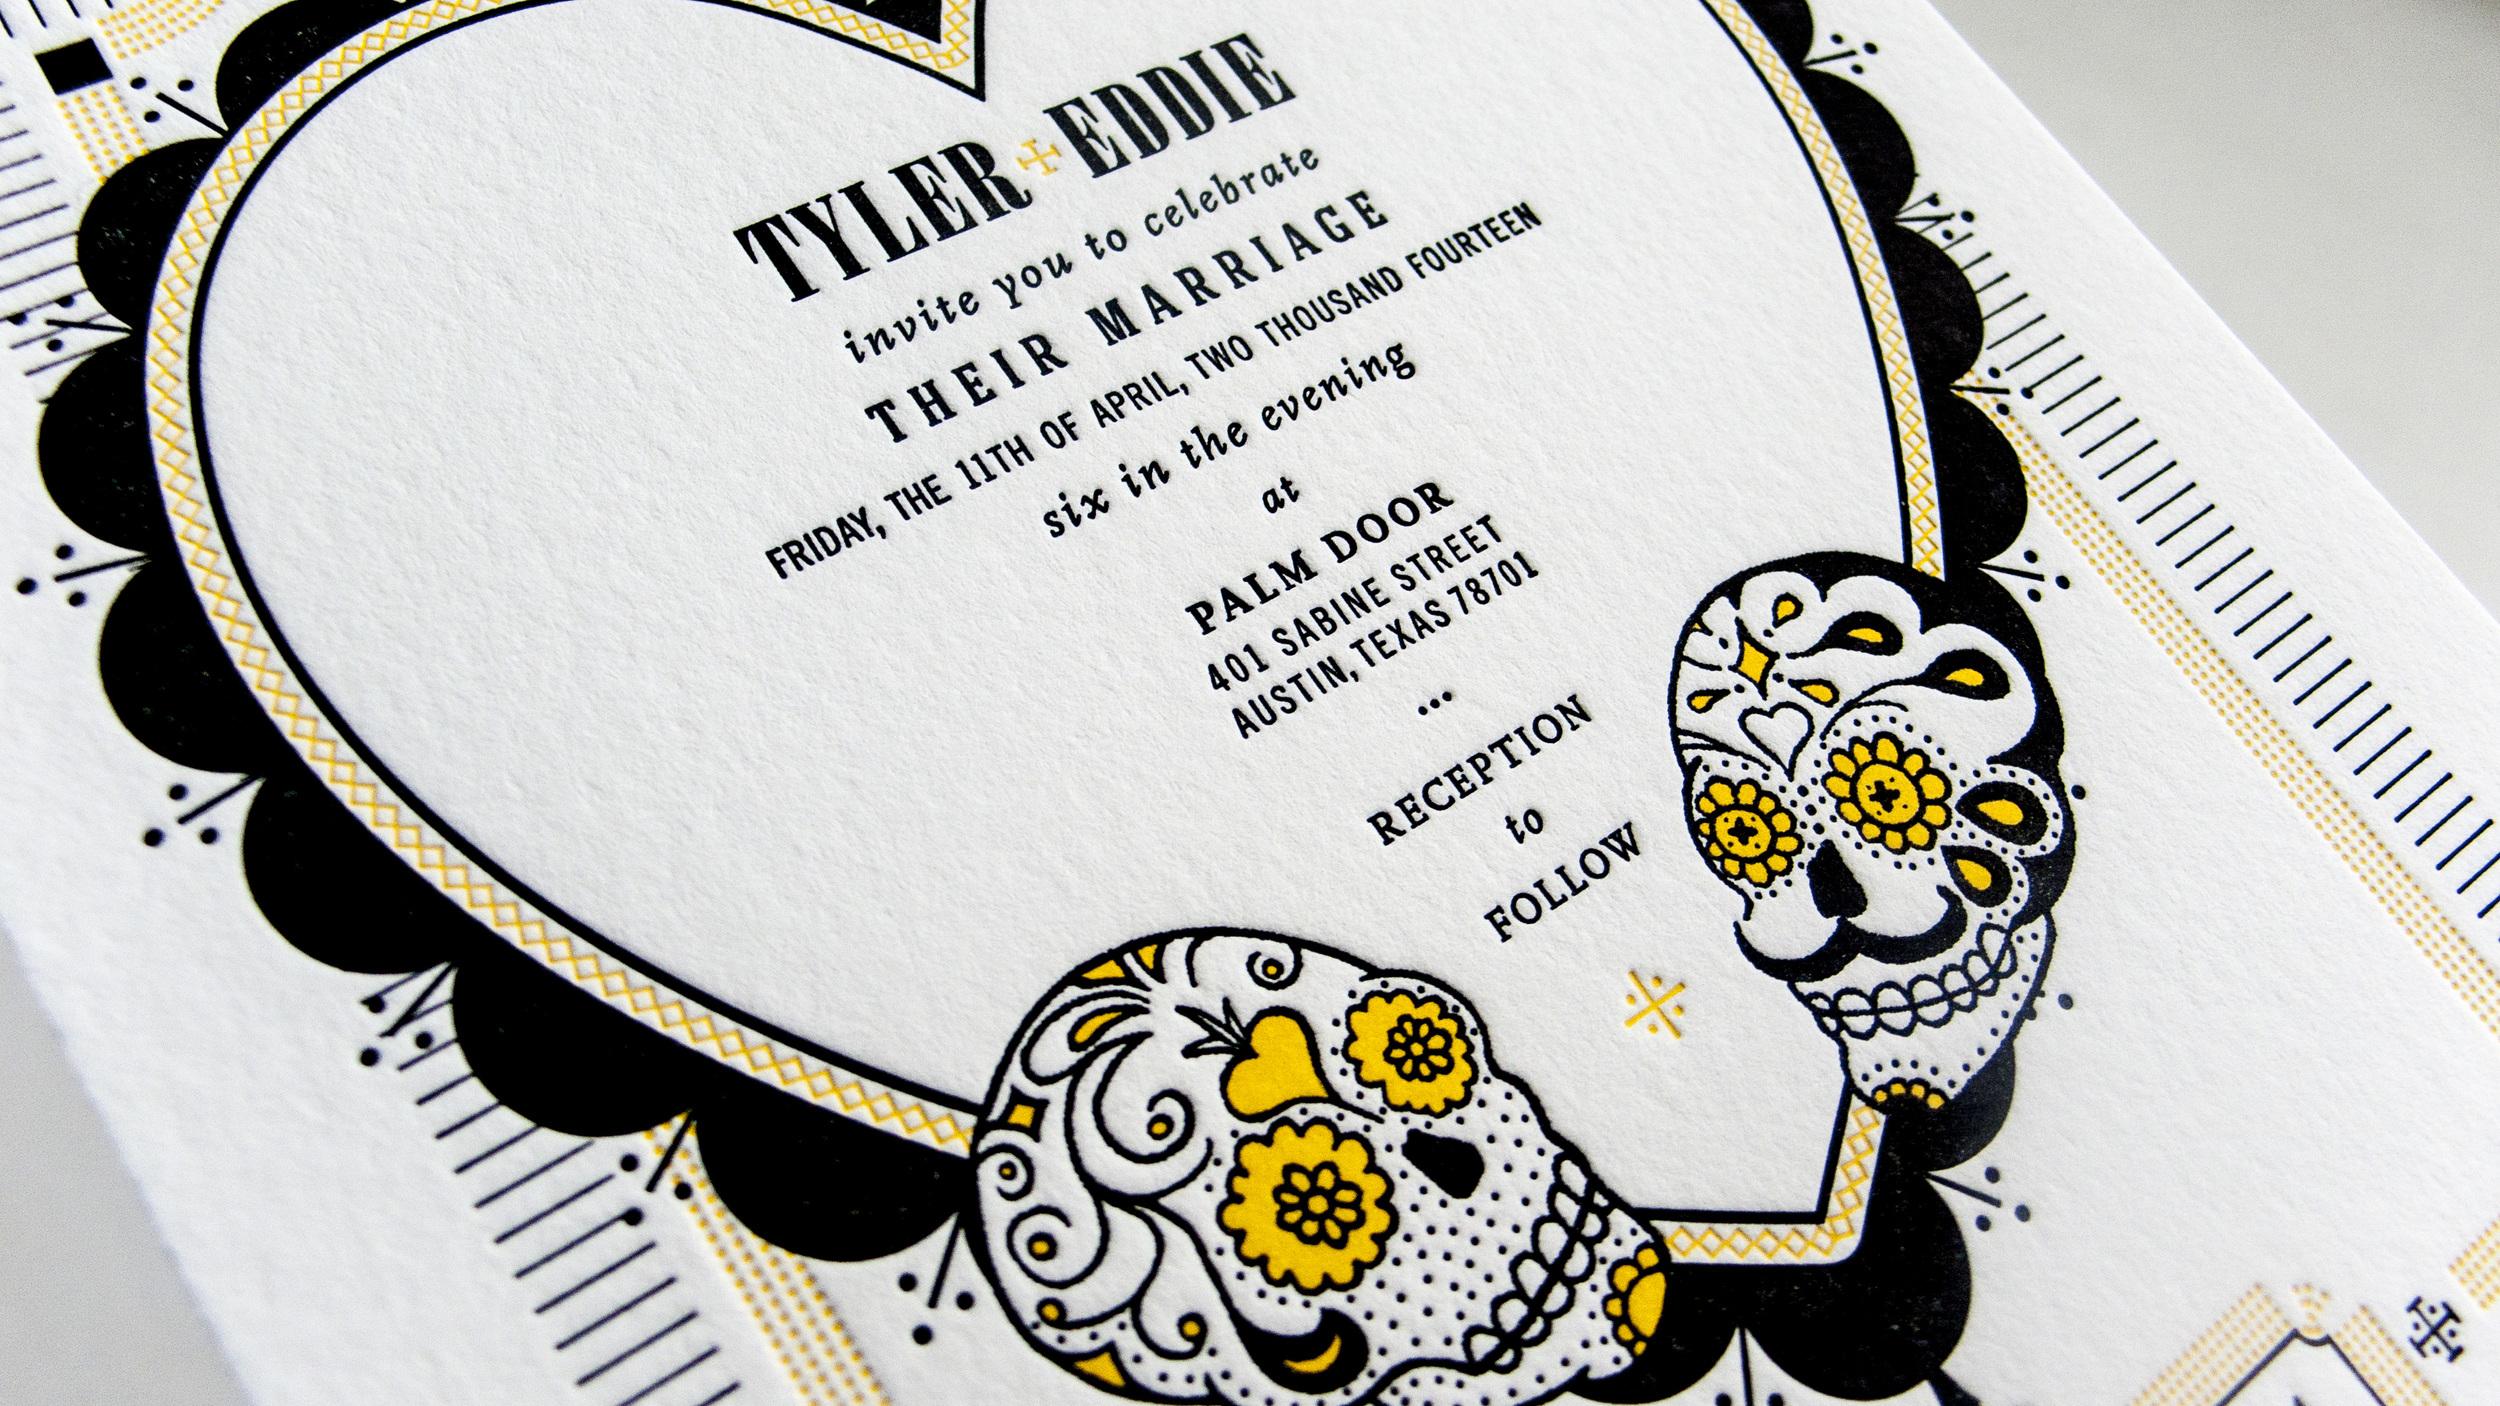 HONORABLE MENTIONED  EPHEMERA:  TYLER & EDDIE'S WEDDING INVITE